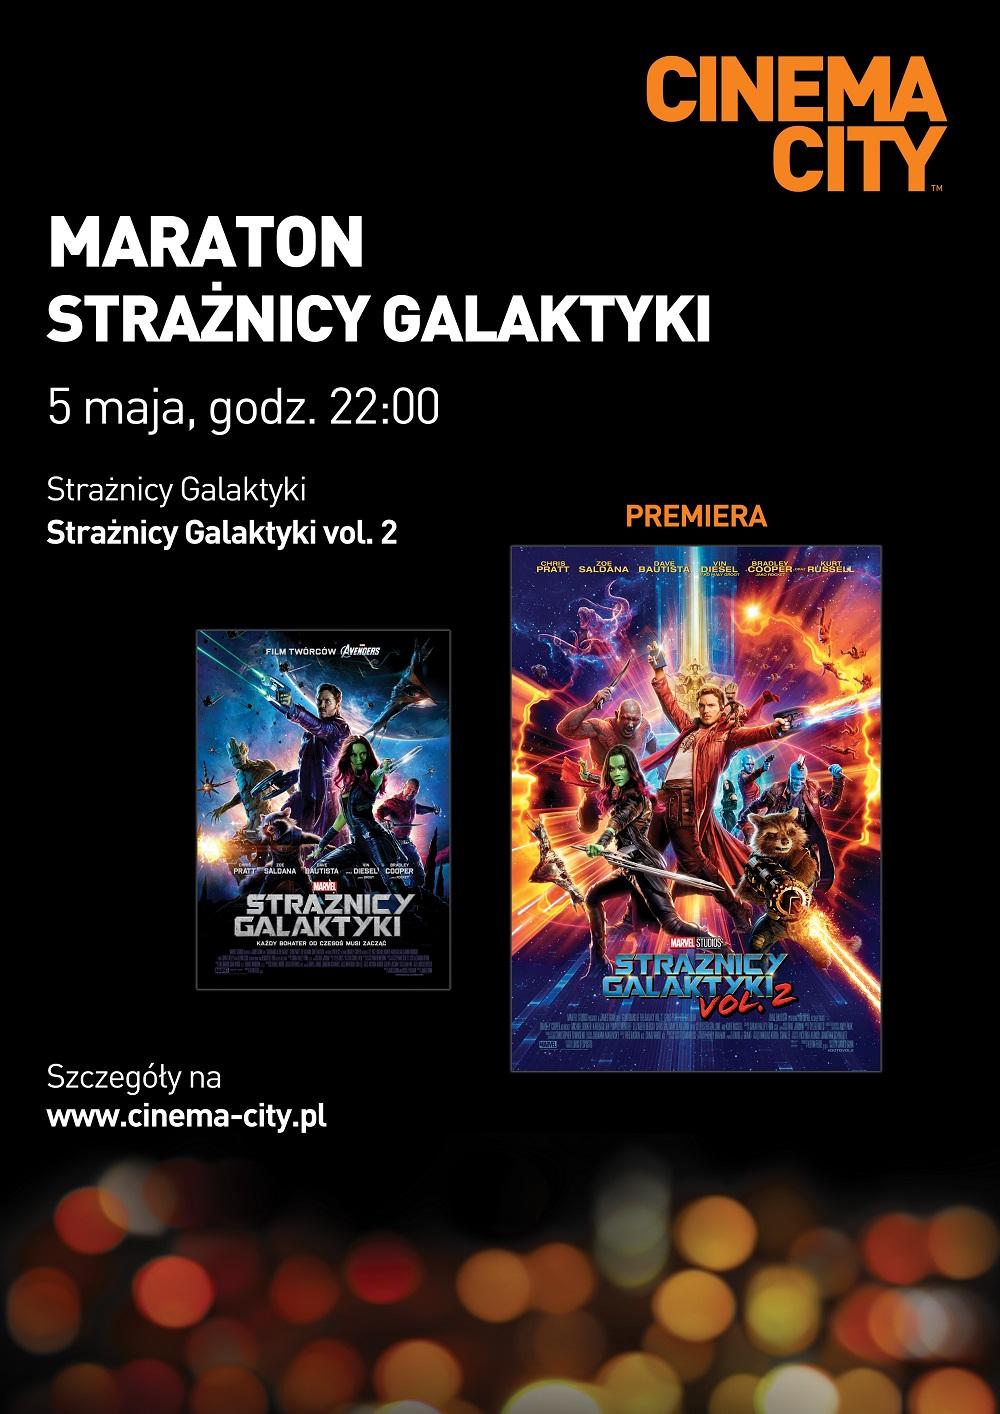 Straznicy_Galaktyki_Maraton_Plakat